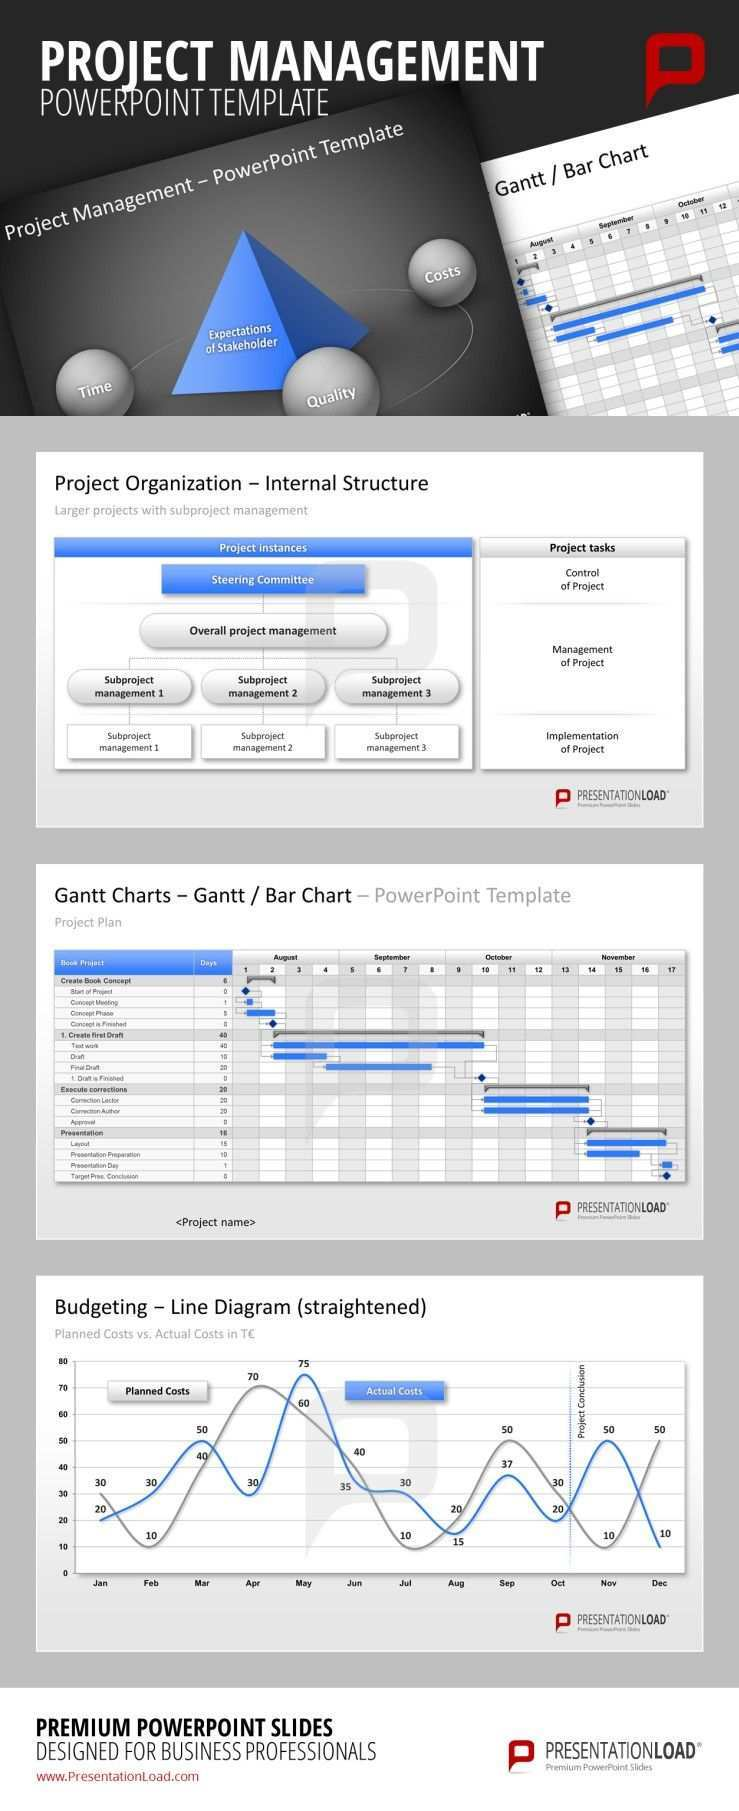 Project Management Premium Toolbox Presentationload Project Management Project Management Tools Project Management Templates